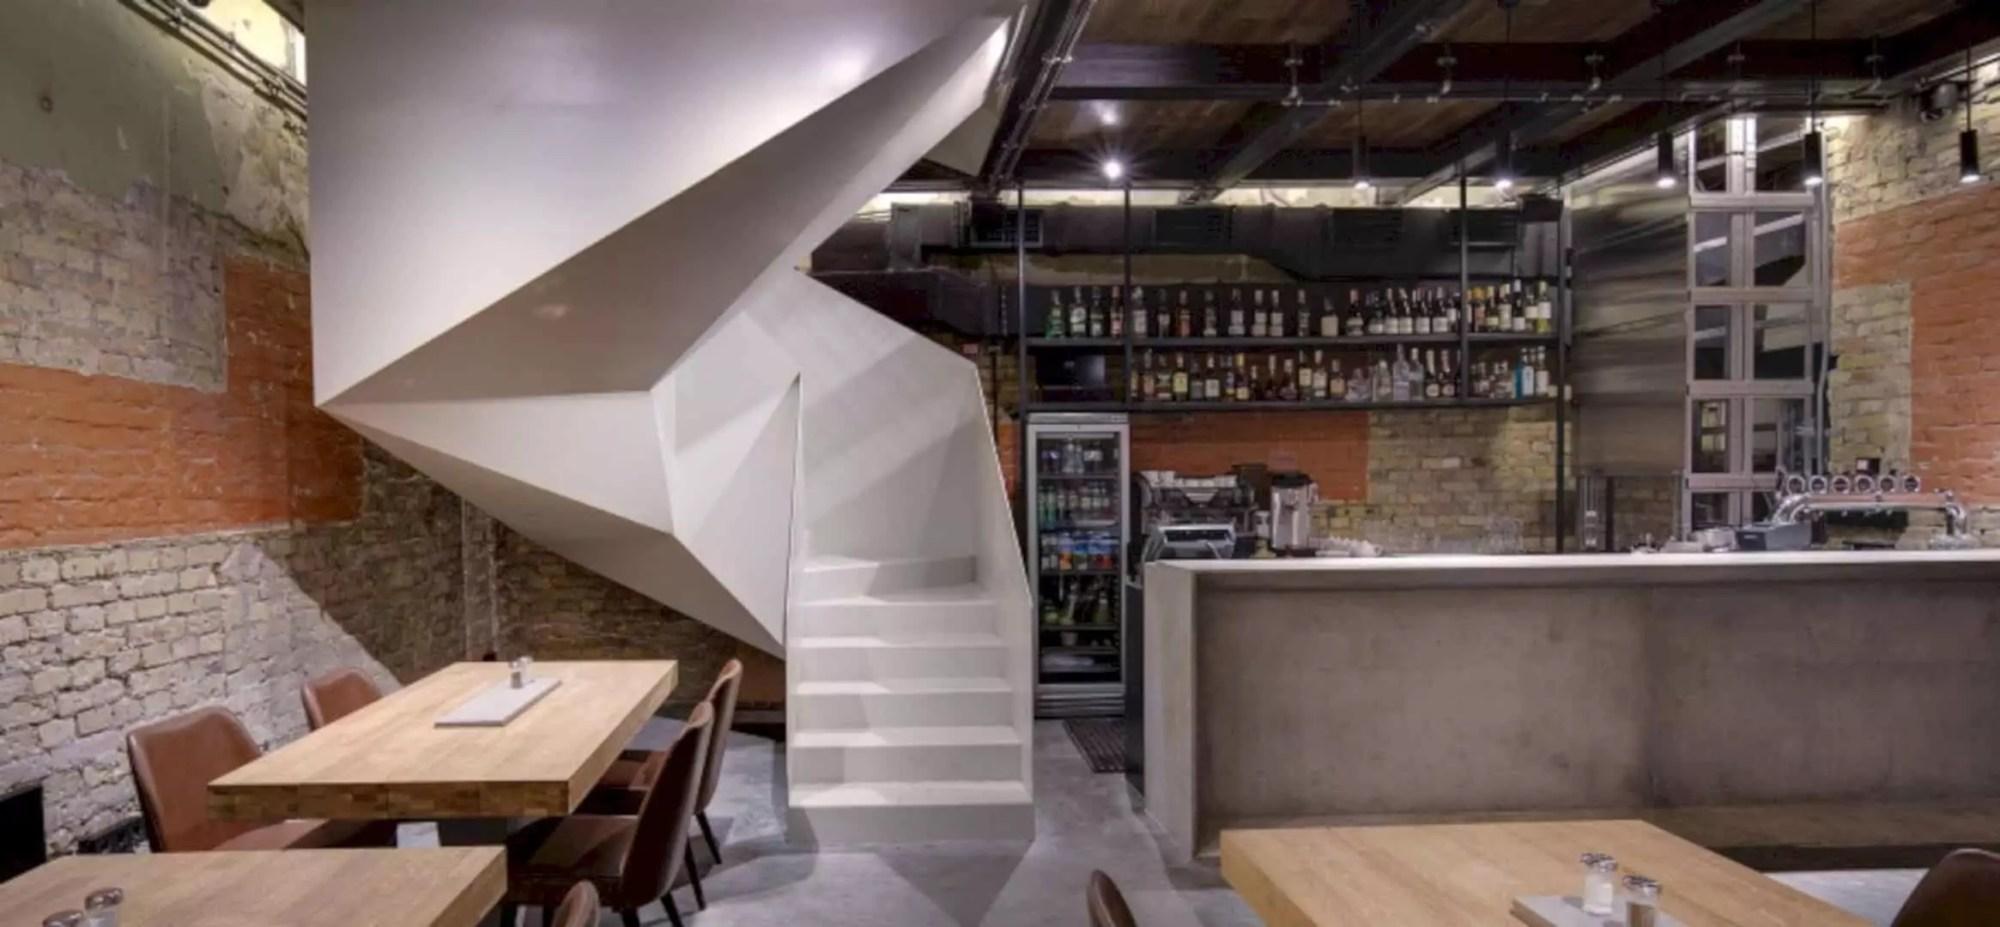 Pivna Duma: Rustic Interior of An Awesome Restaurant in Ukraine